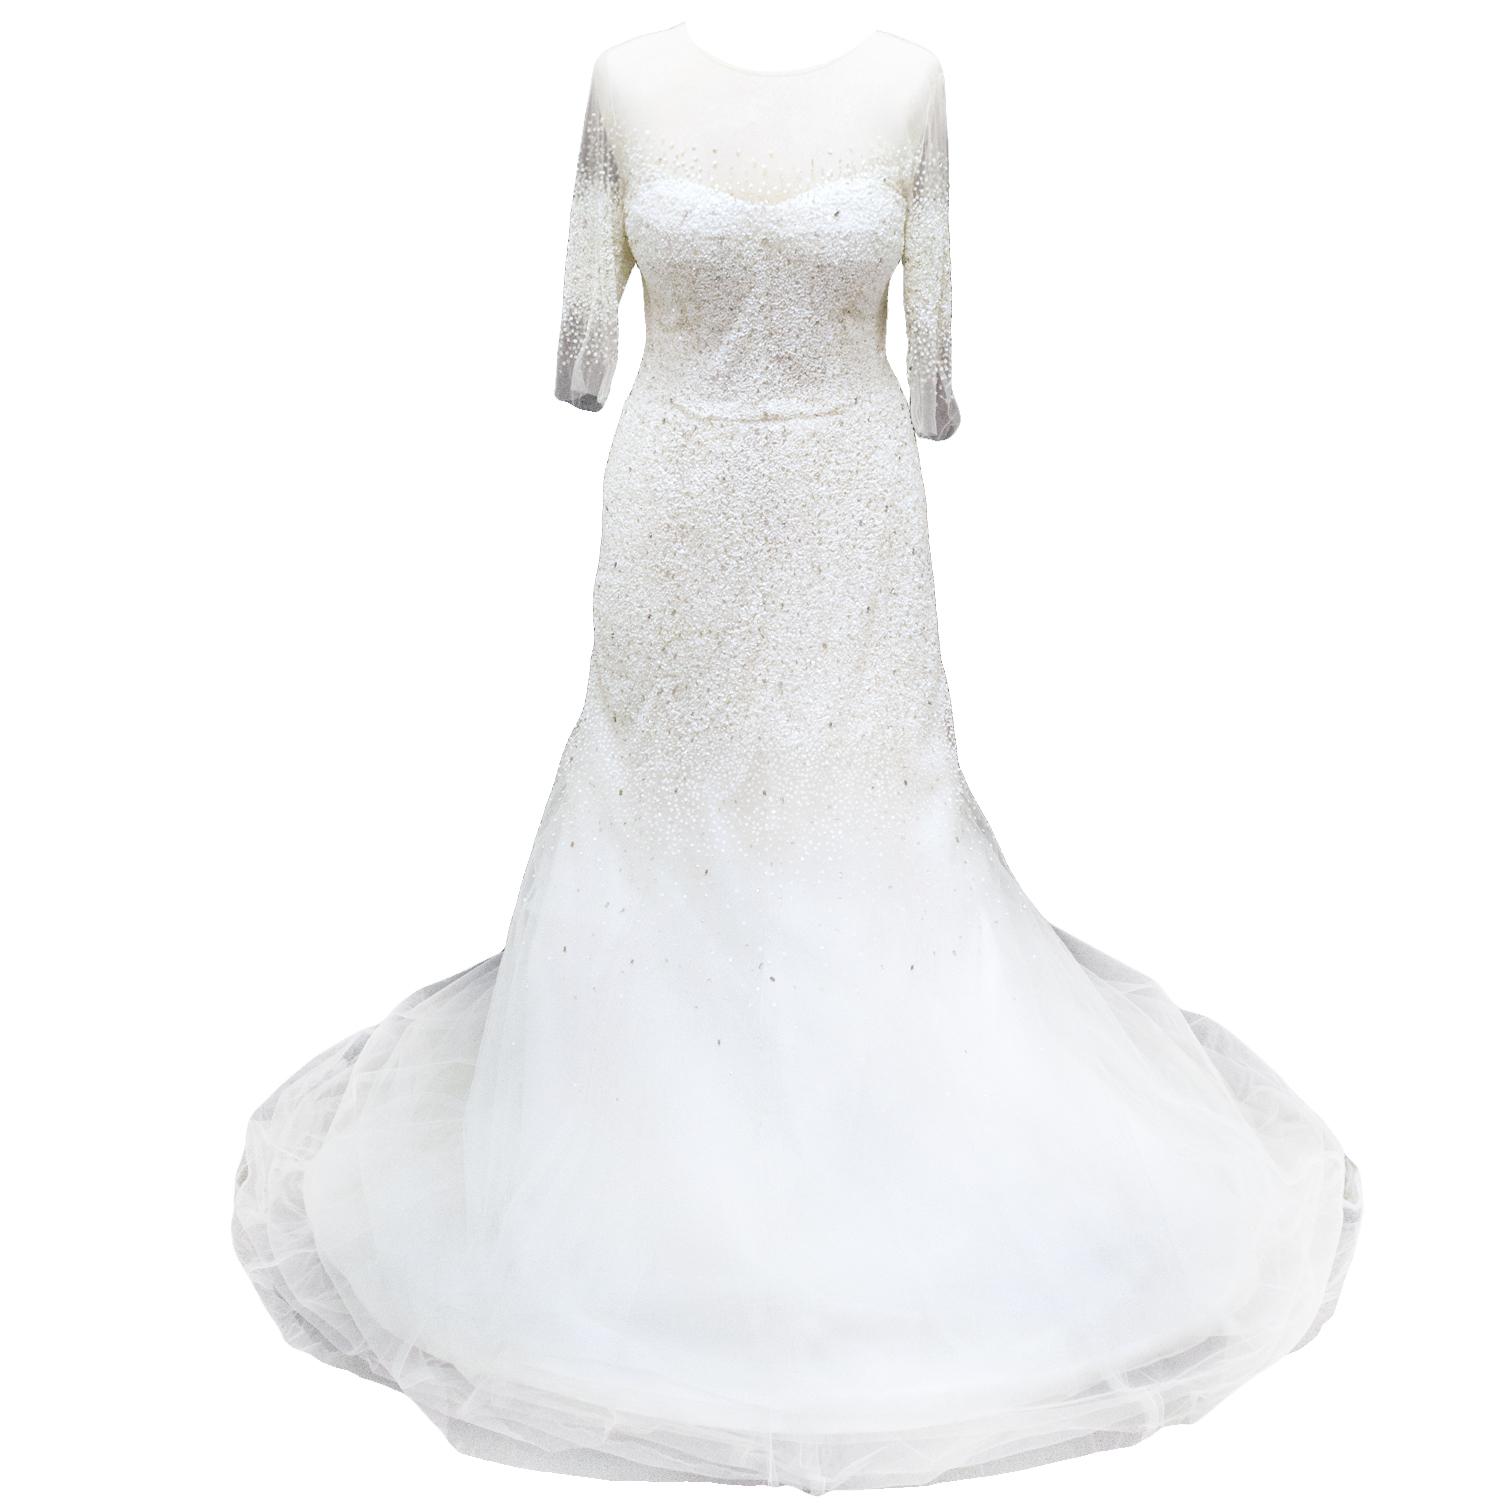 Monique Lhullier Custom Made Embellished Wedding Dress Part 1/2